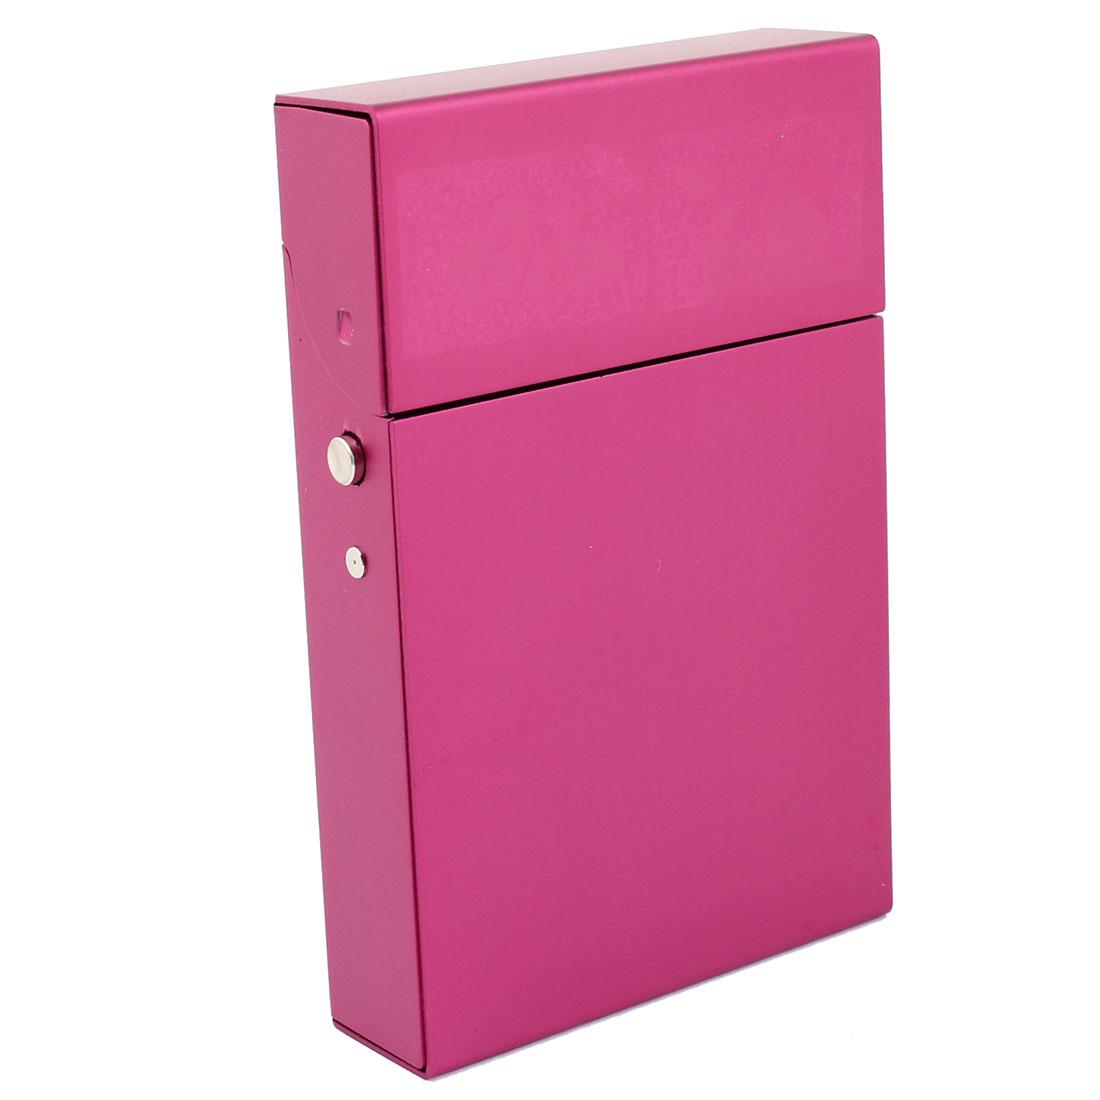 9.2cm Long Fuchsia Aluminum Press Open Buckle Cigarette Case Holder